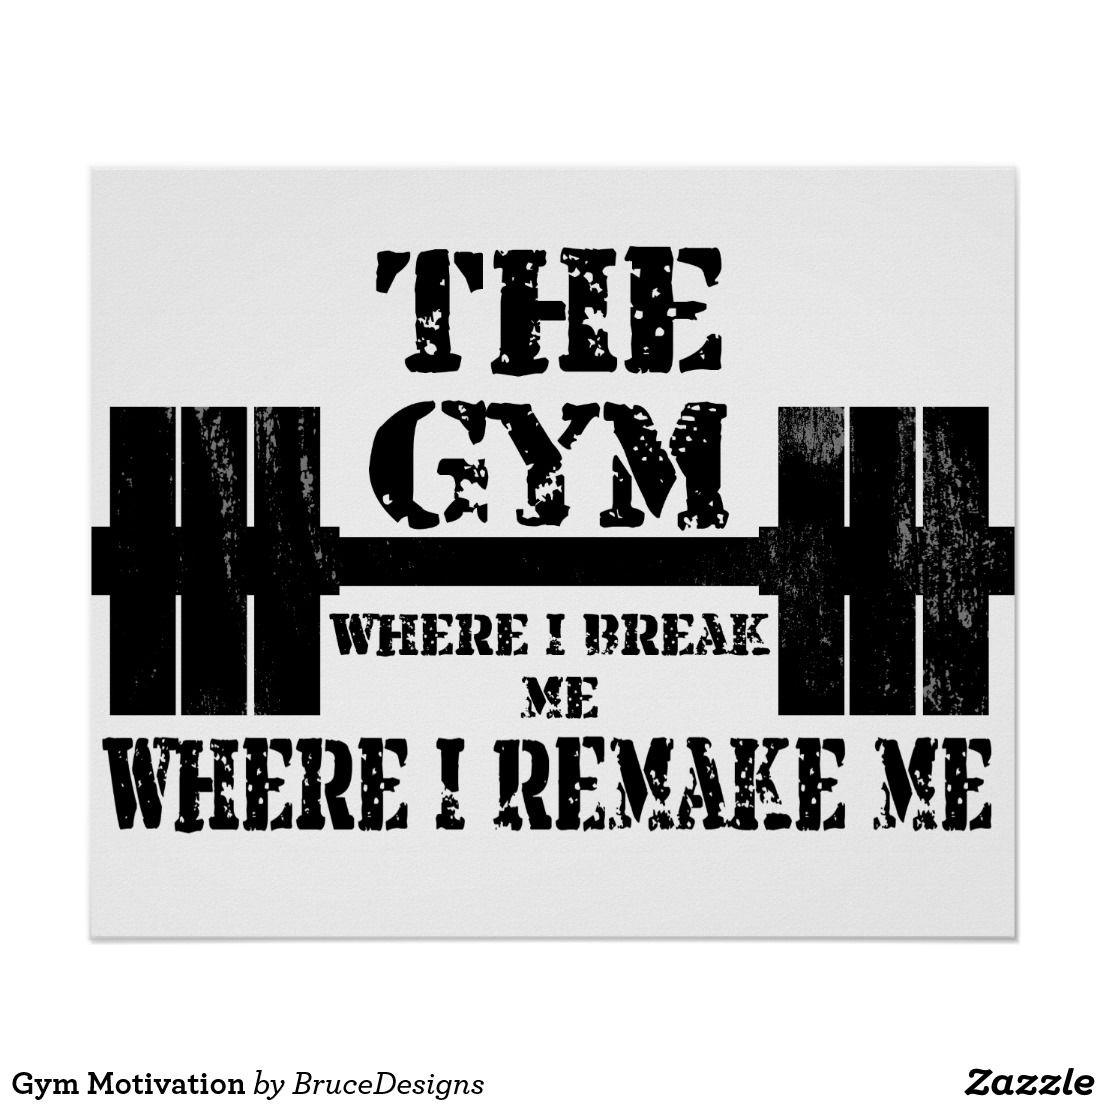 Gym Motivation Poster Zazzle Com Gym Motivation Motivation